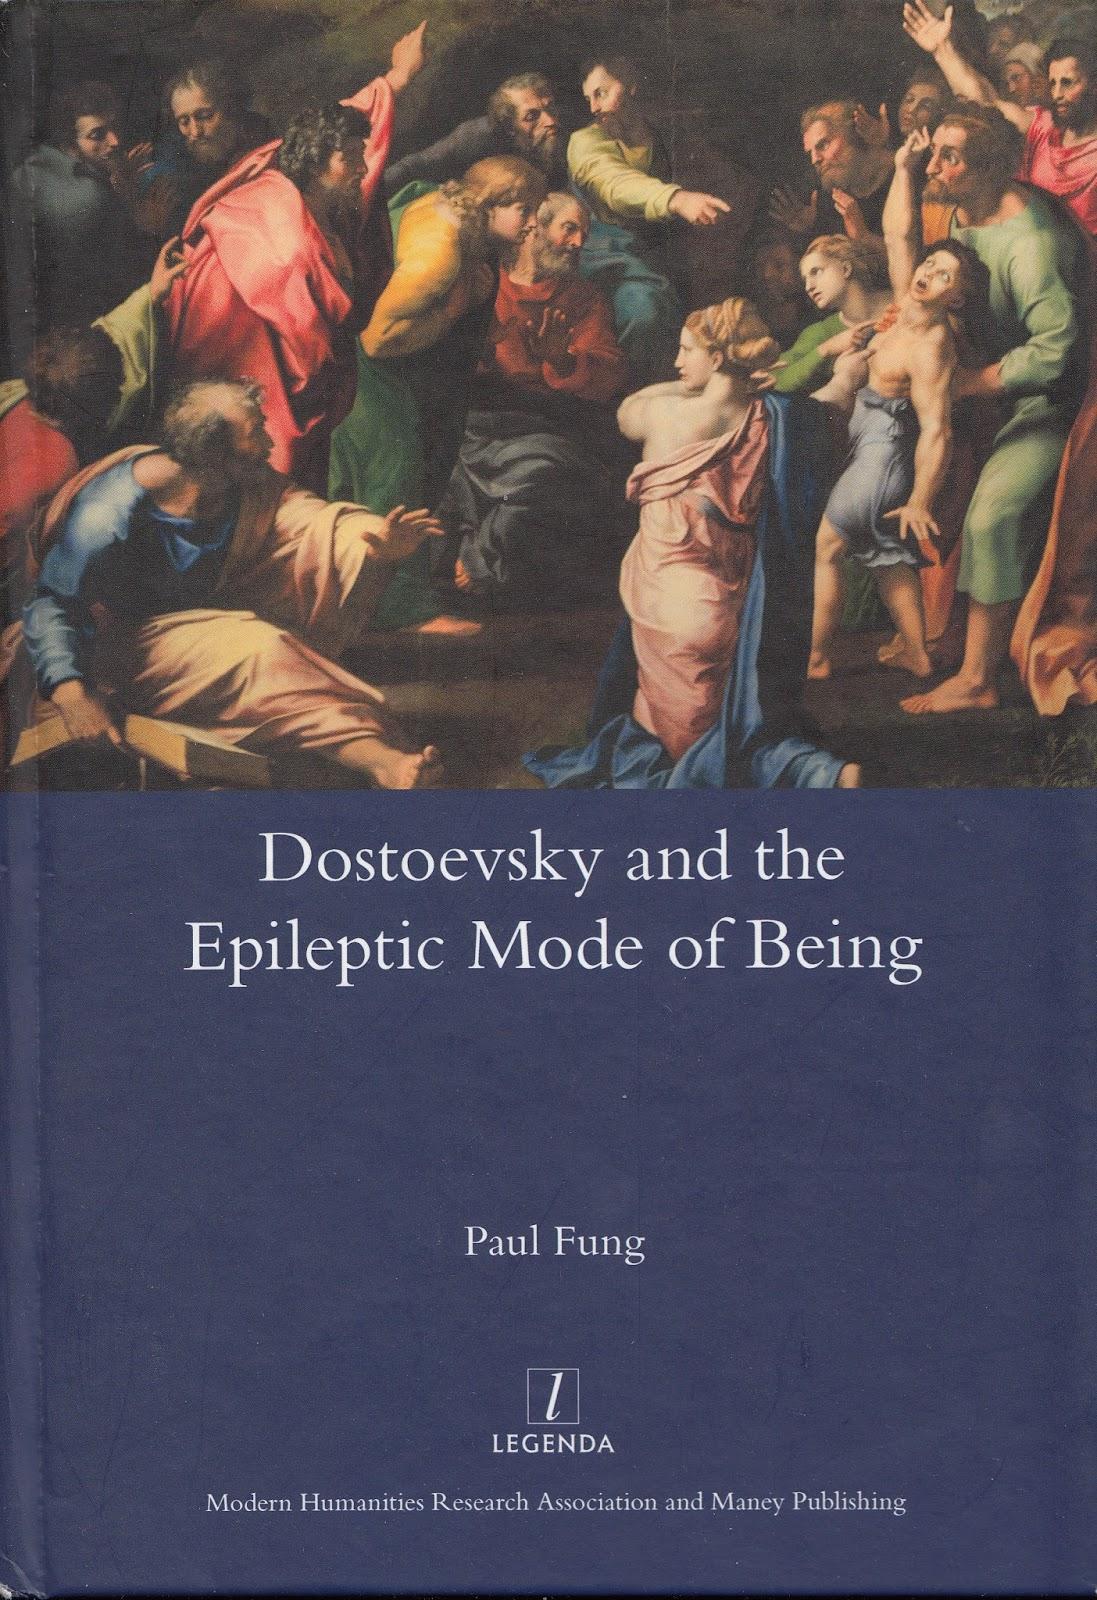 dostoevsky brothers karamazov